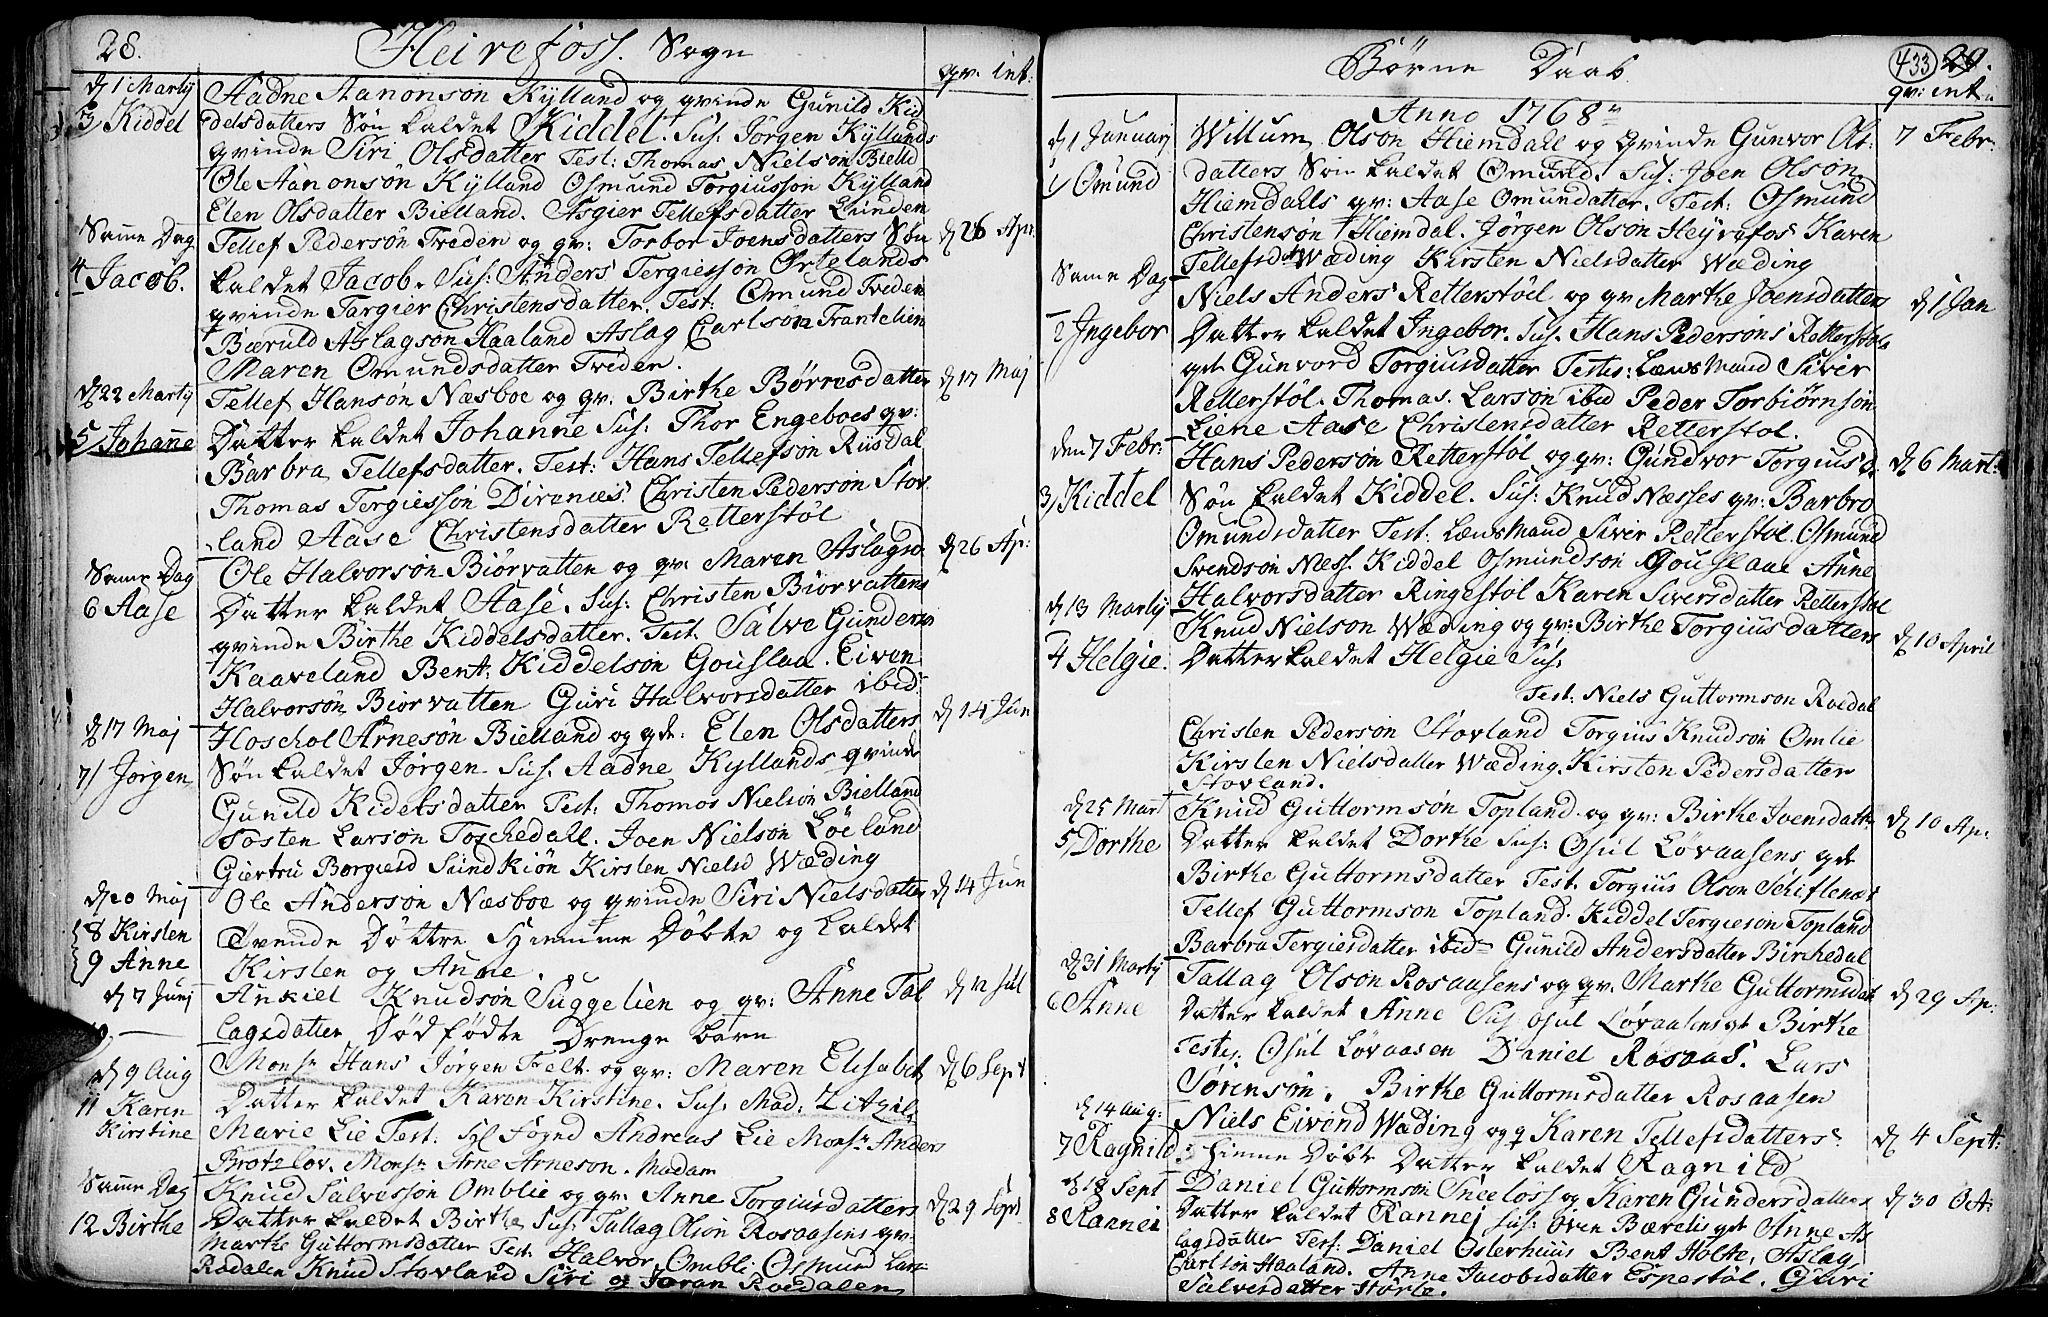 SAK, Hommedal sokneprestkontor, F/Fa/Fab/L0002: Ministerialbok nr. A 2 /3, 1740-1821, s. 433